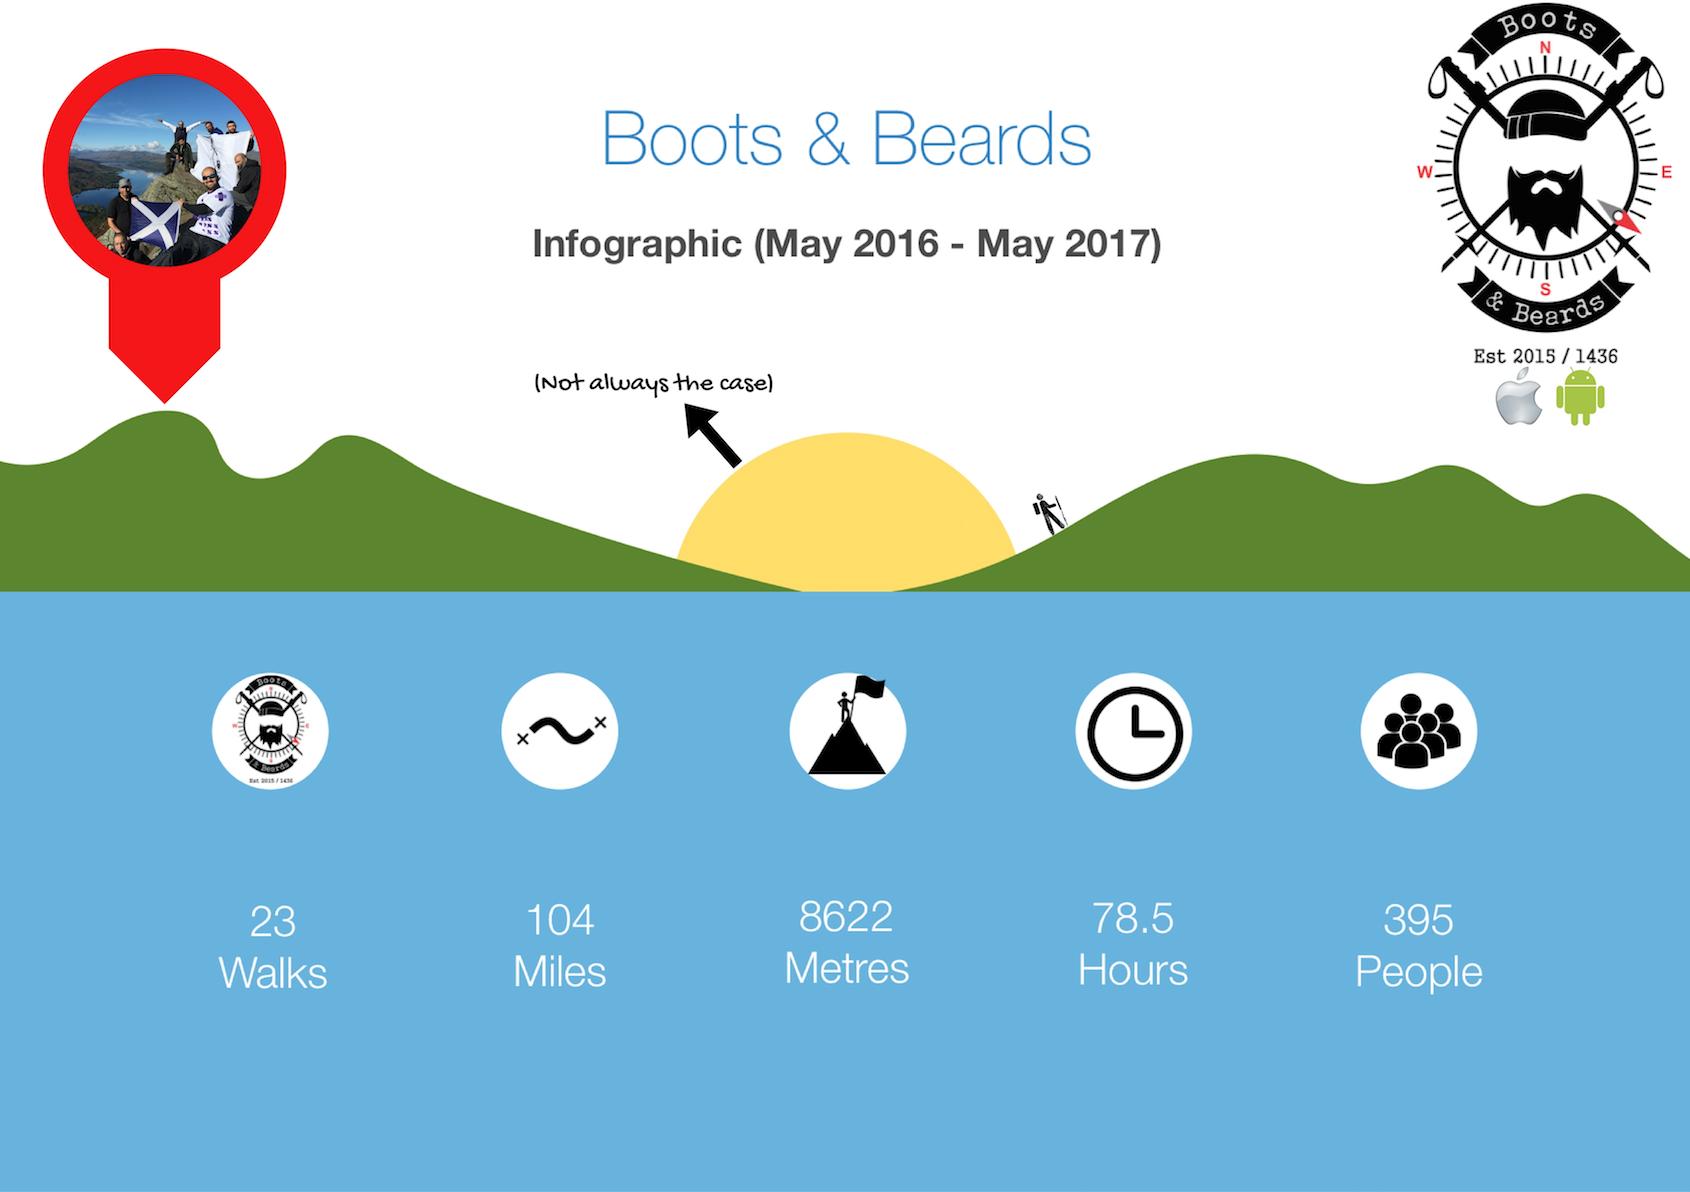 boots and beards hiking hill walking stats pakistani bme cemvo scotland tourist.png